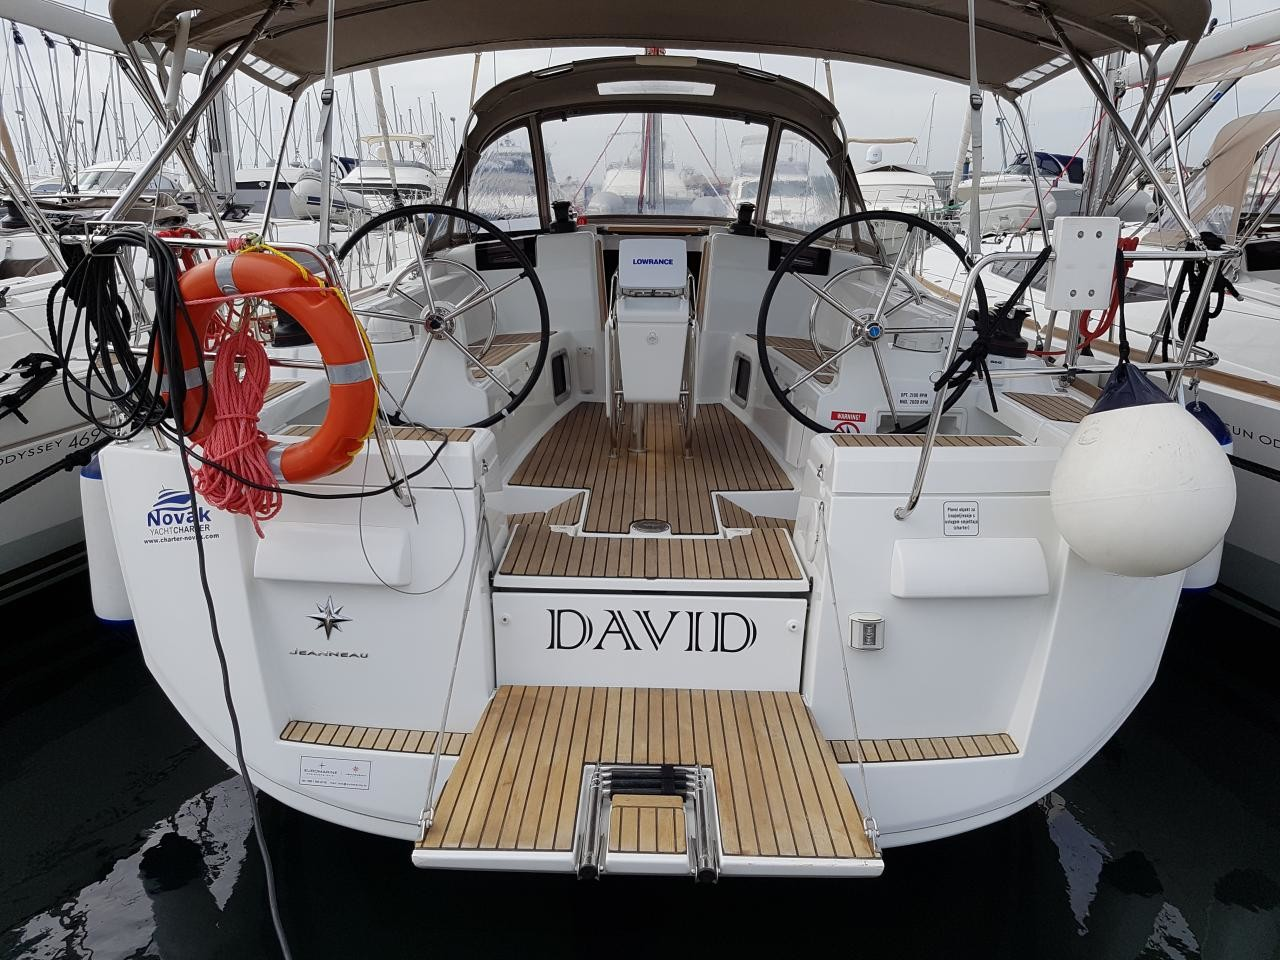 Sun Odyssey 409, David